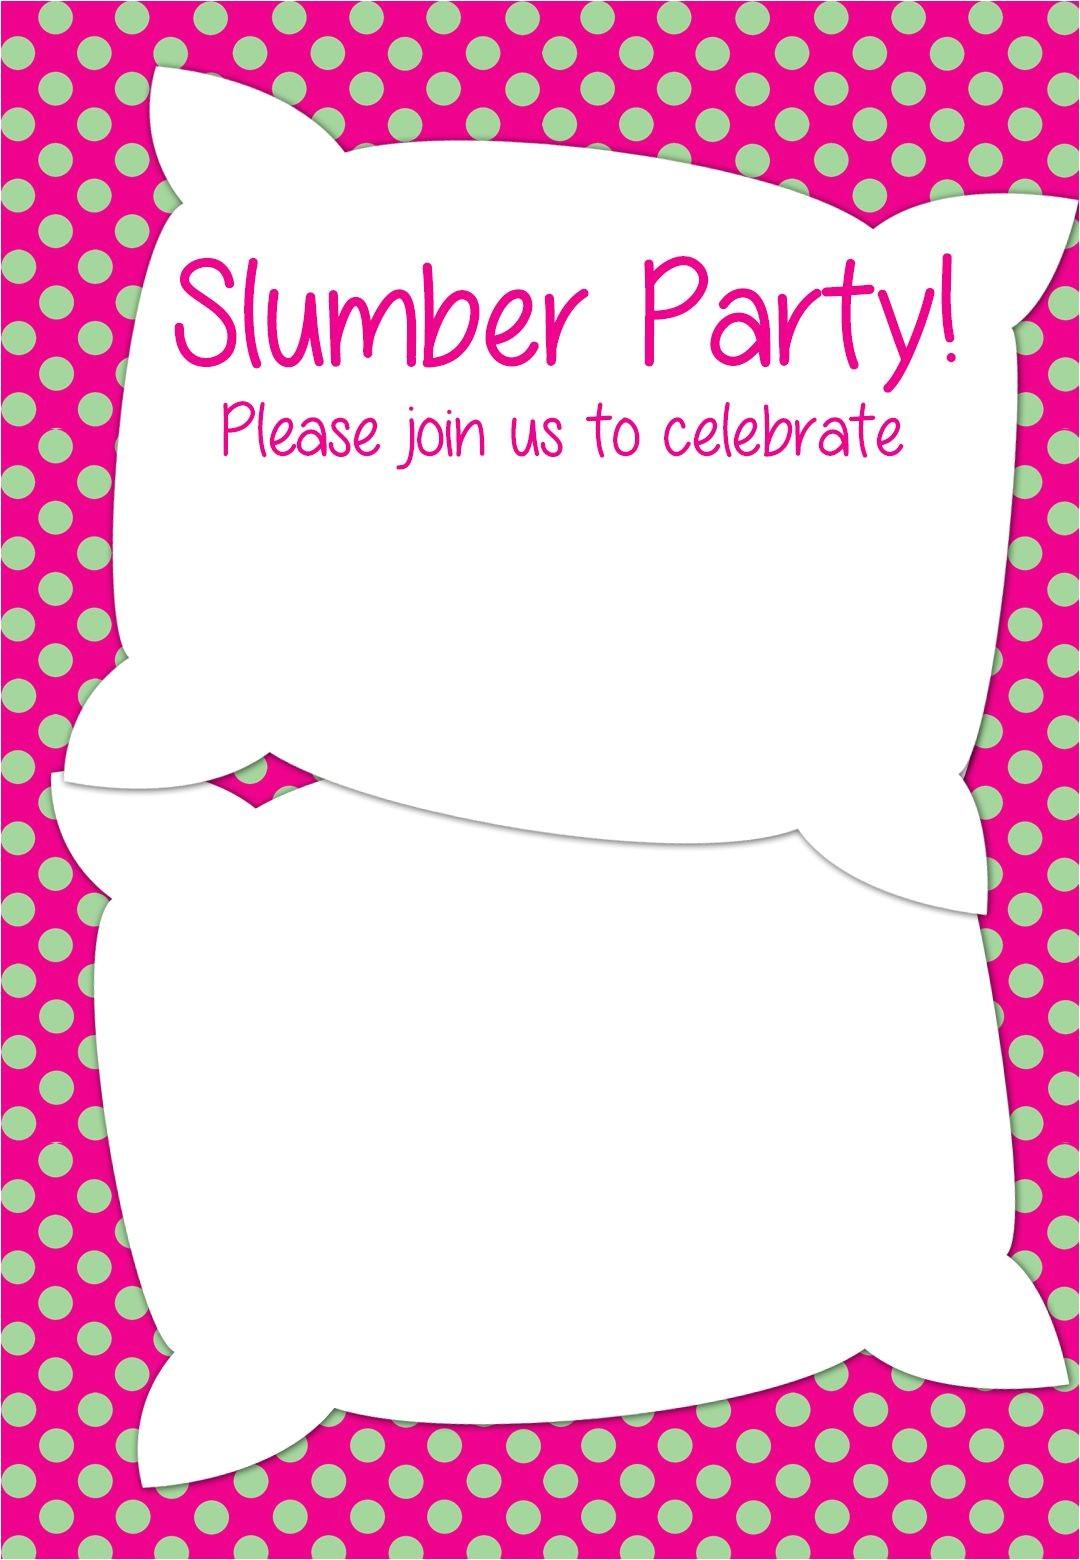 Free Slumber Party Invitations to Print Free Printable Slumber Party Invitation